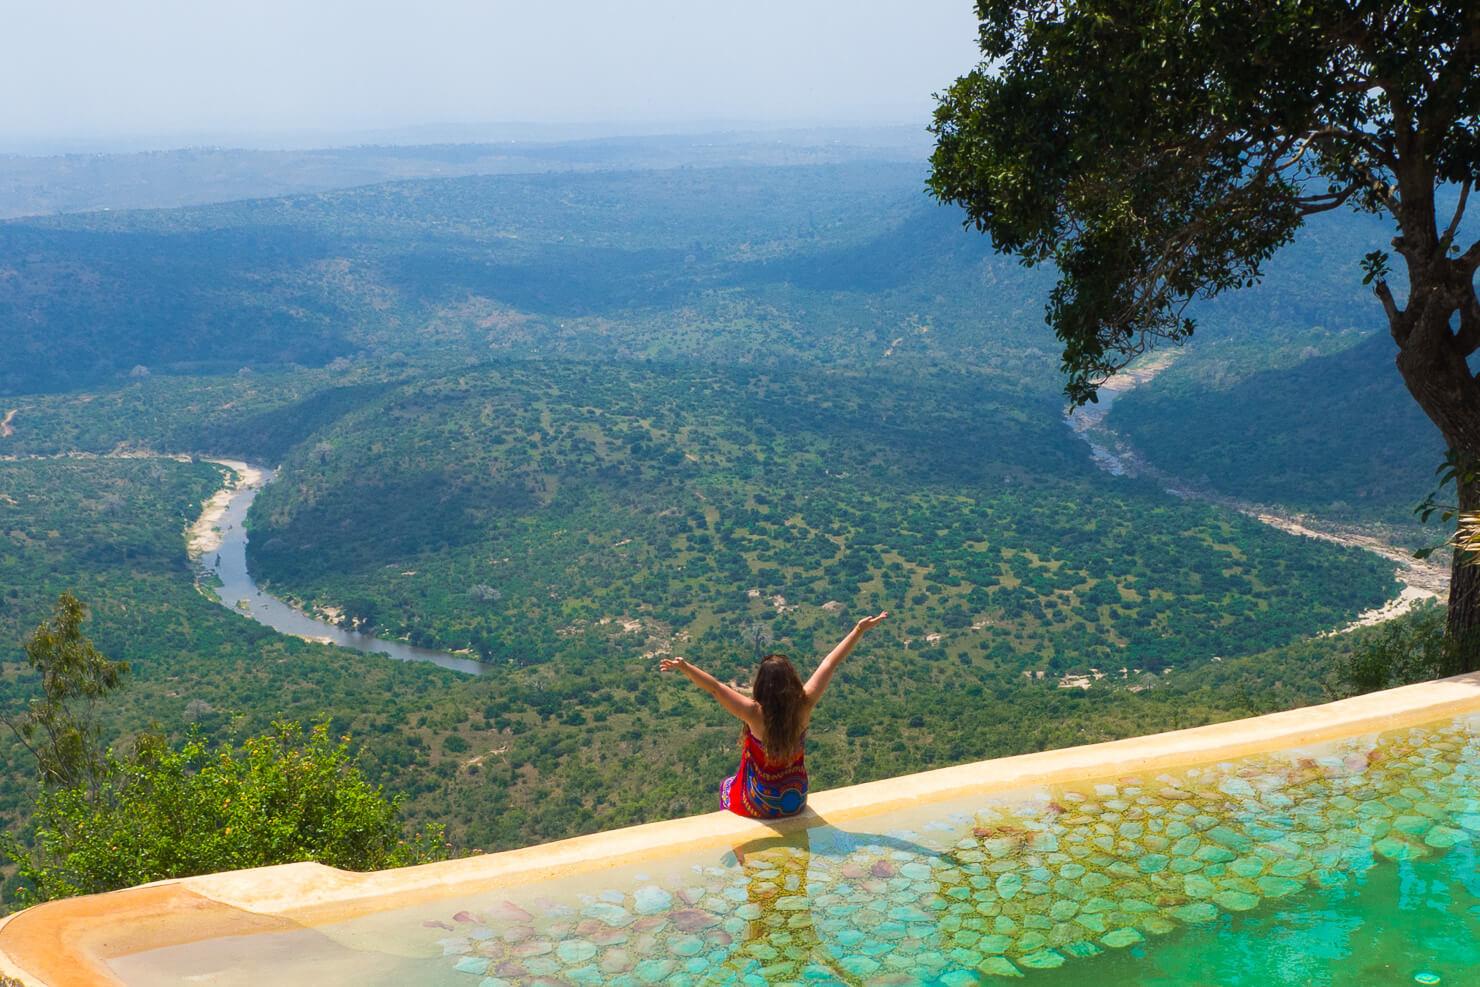 Shimba Hills, Kenya - Helen in Wonderlust